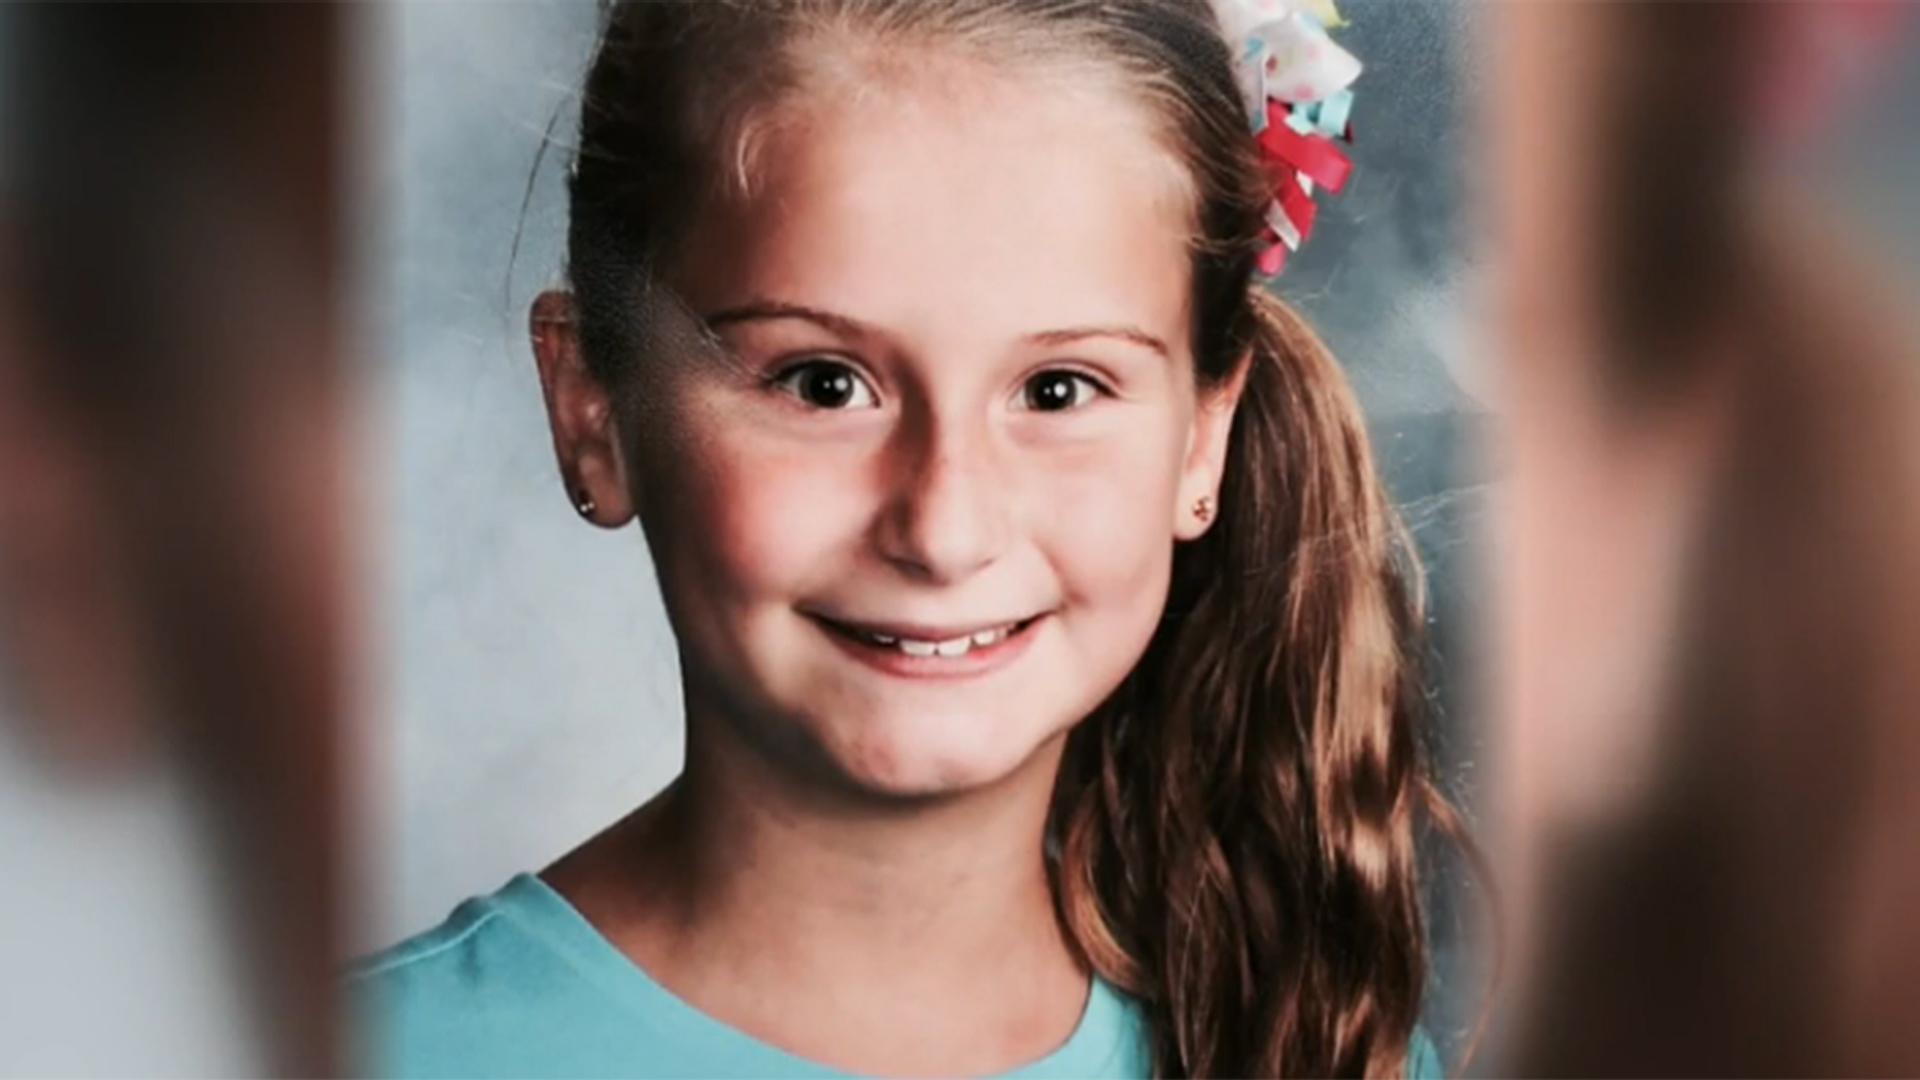 Ohio Girl, 10, Dies in House Fire Hours Before Rape Suspect's Trial Begins